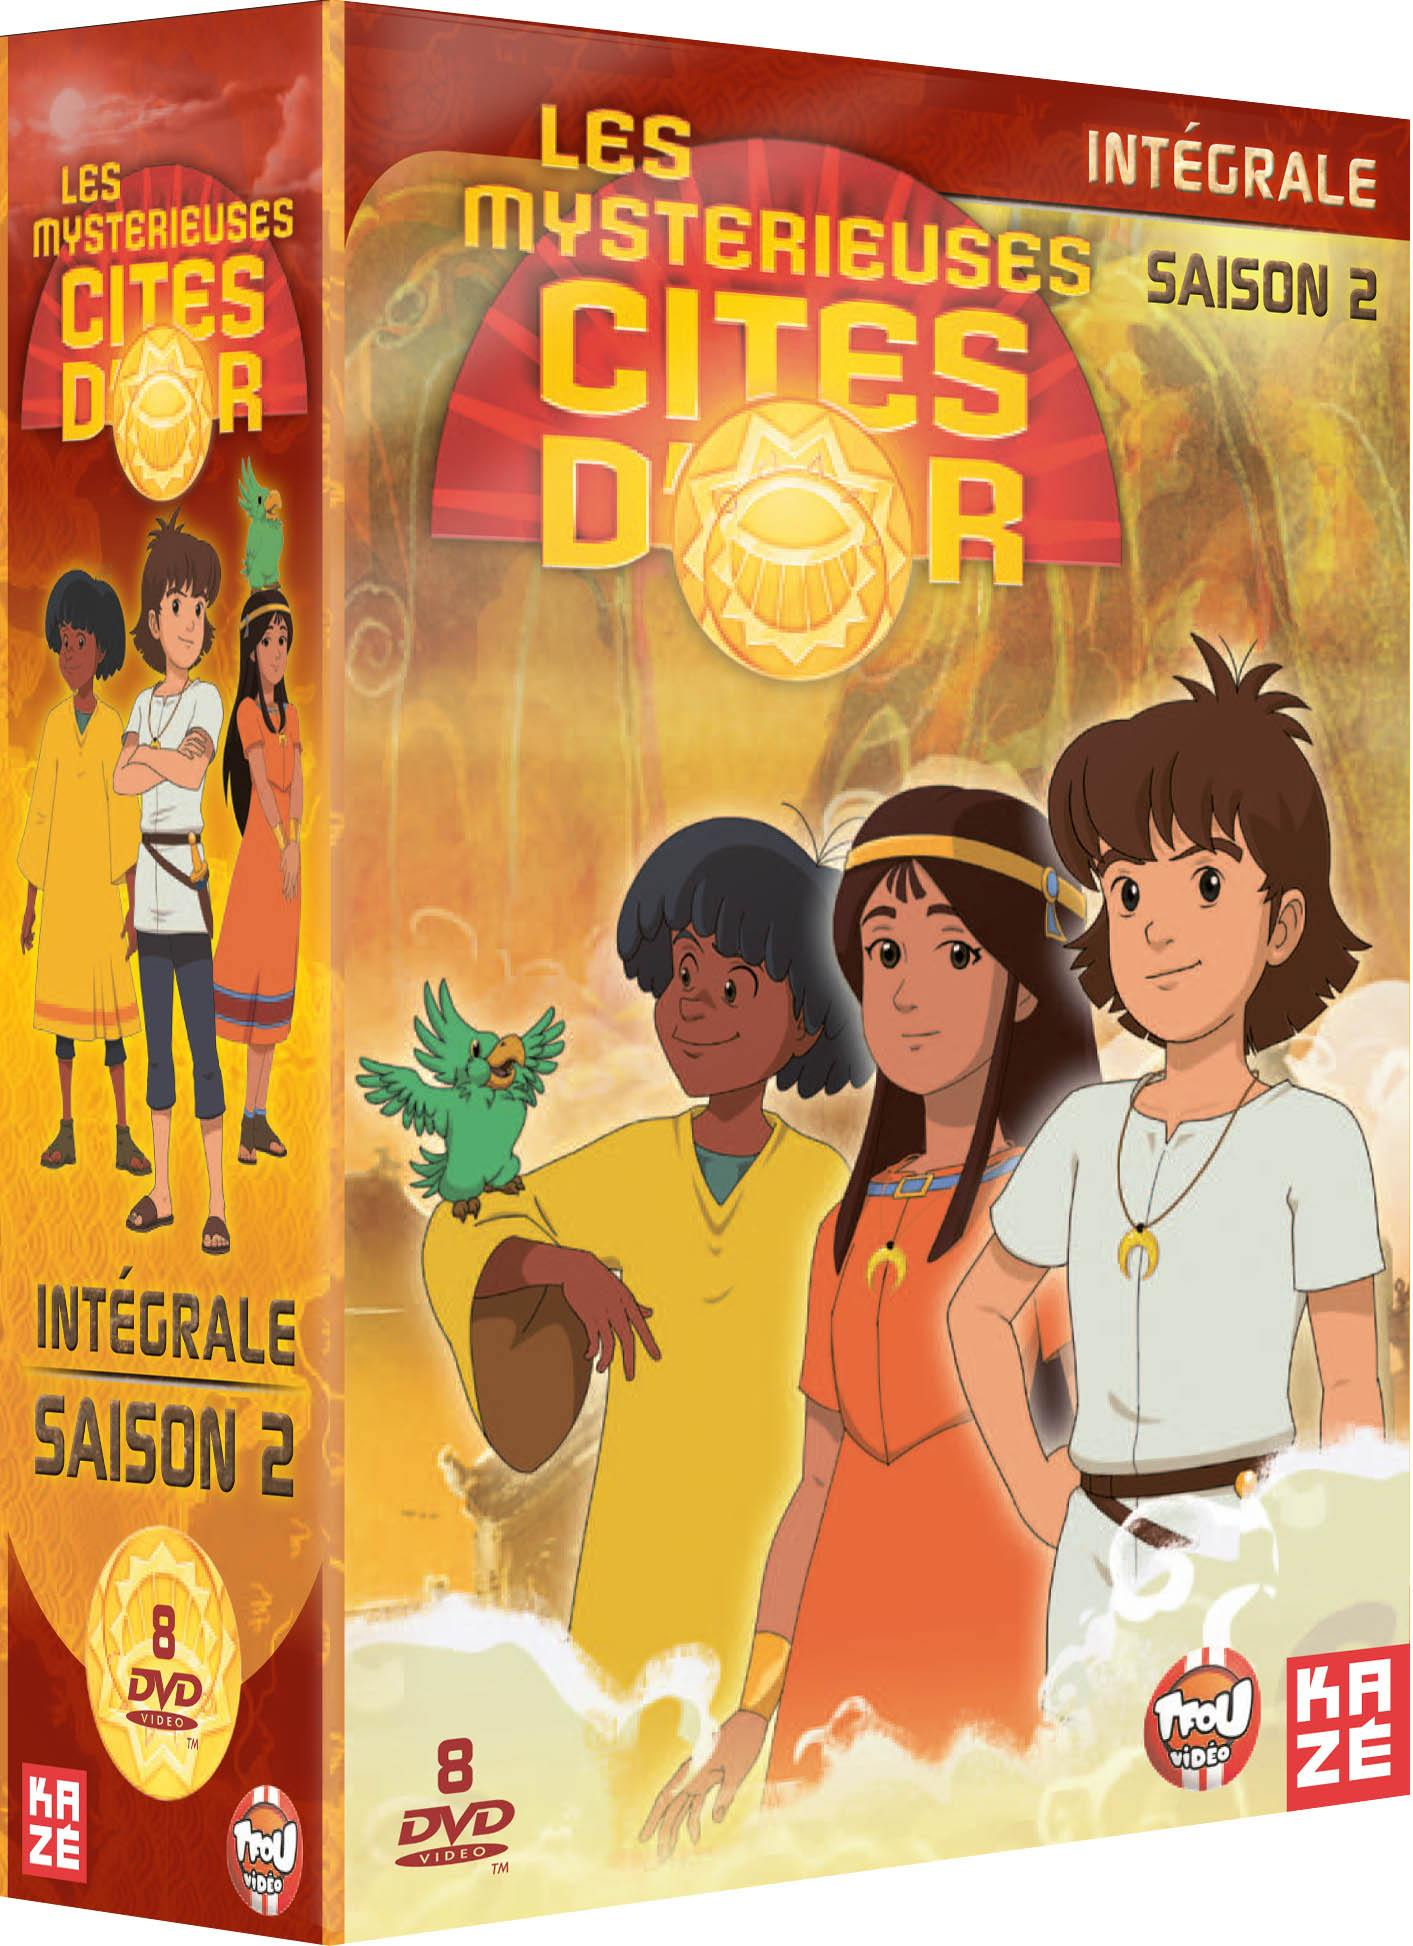 Mysterieuses cites d or (les) - saison 2 - 8 dvd - exclu sites manga